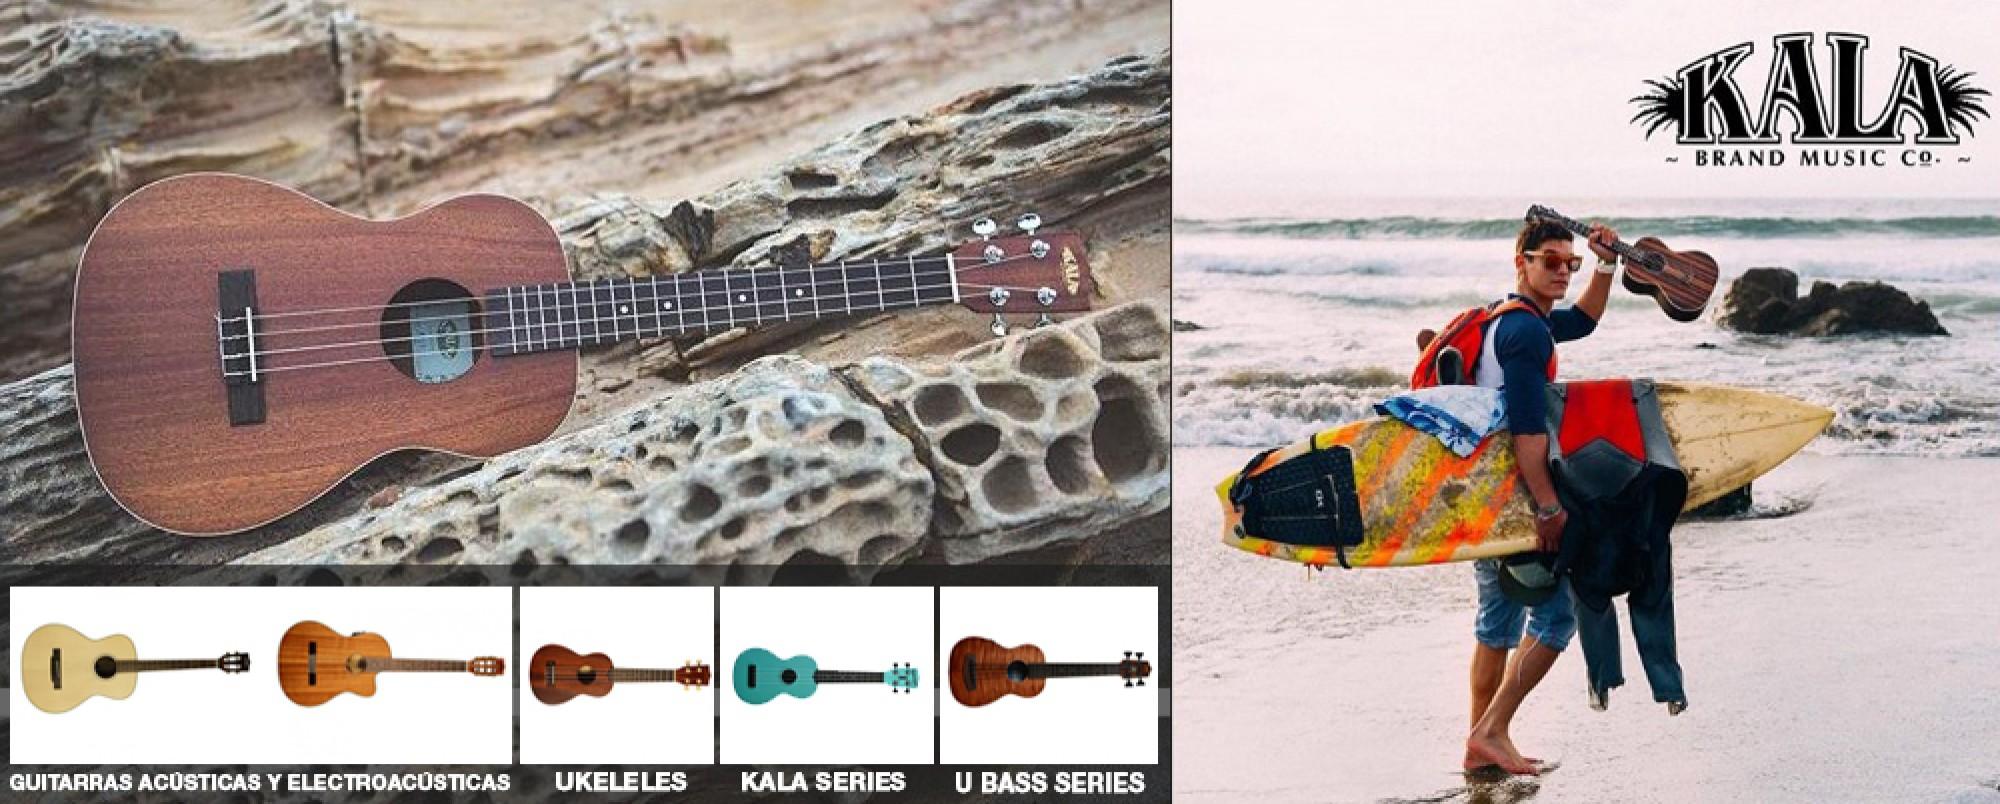 537-KALA-Ukeleles-U-Bass-Guitarras-y-mucho-mas-l67ay.jpg